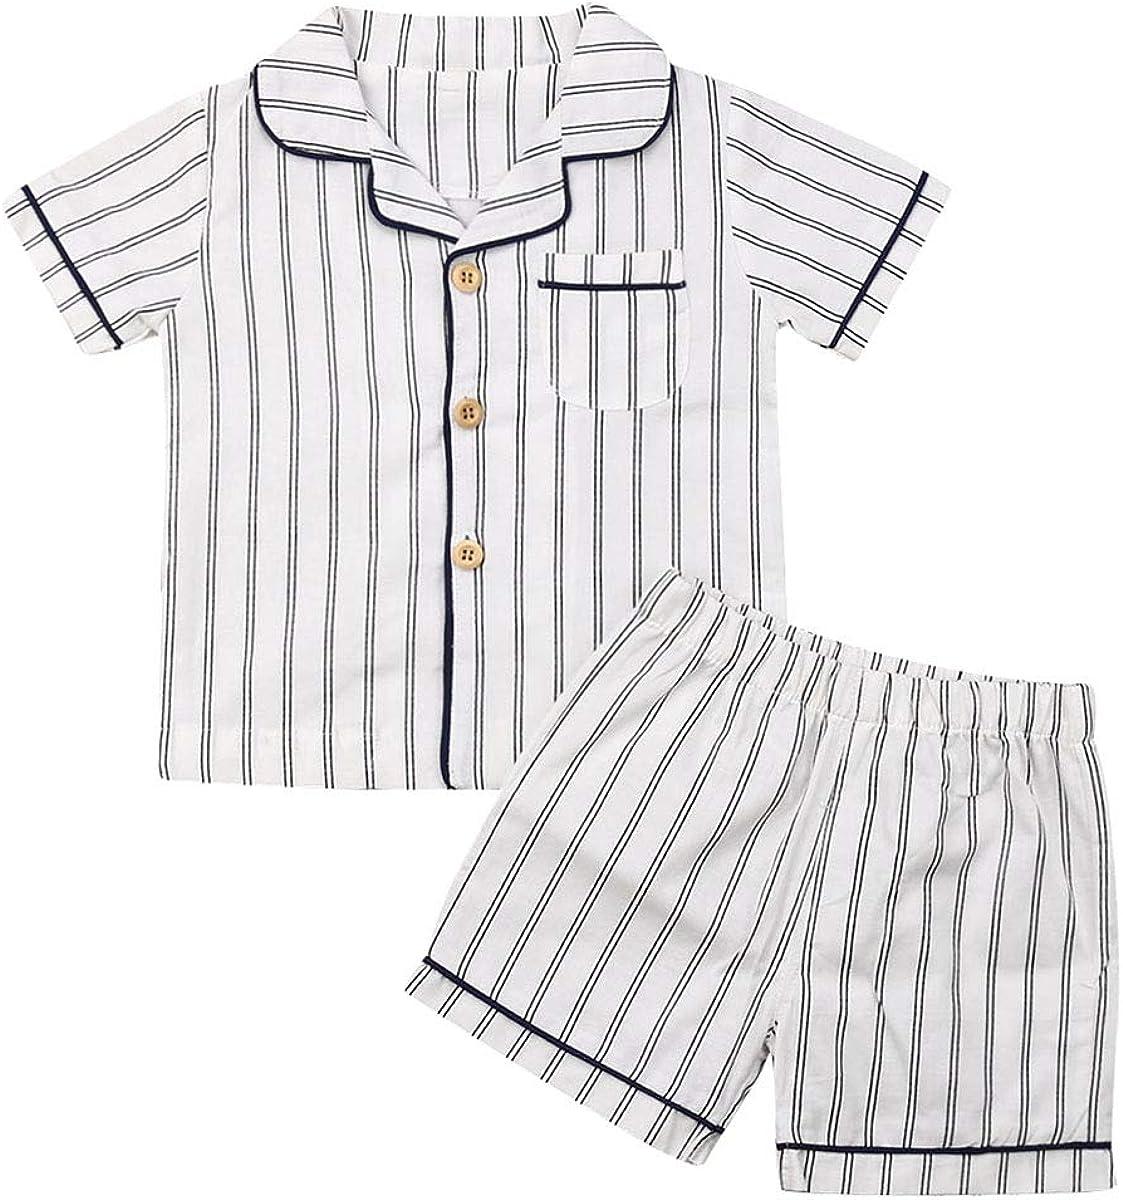 Toddler Infant Baby Boy Girl Pajams Short Sleeve Pjs Set Striped Sleepwear Nightwear Summer Outfits Set